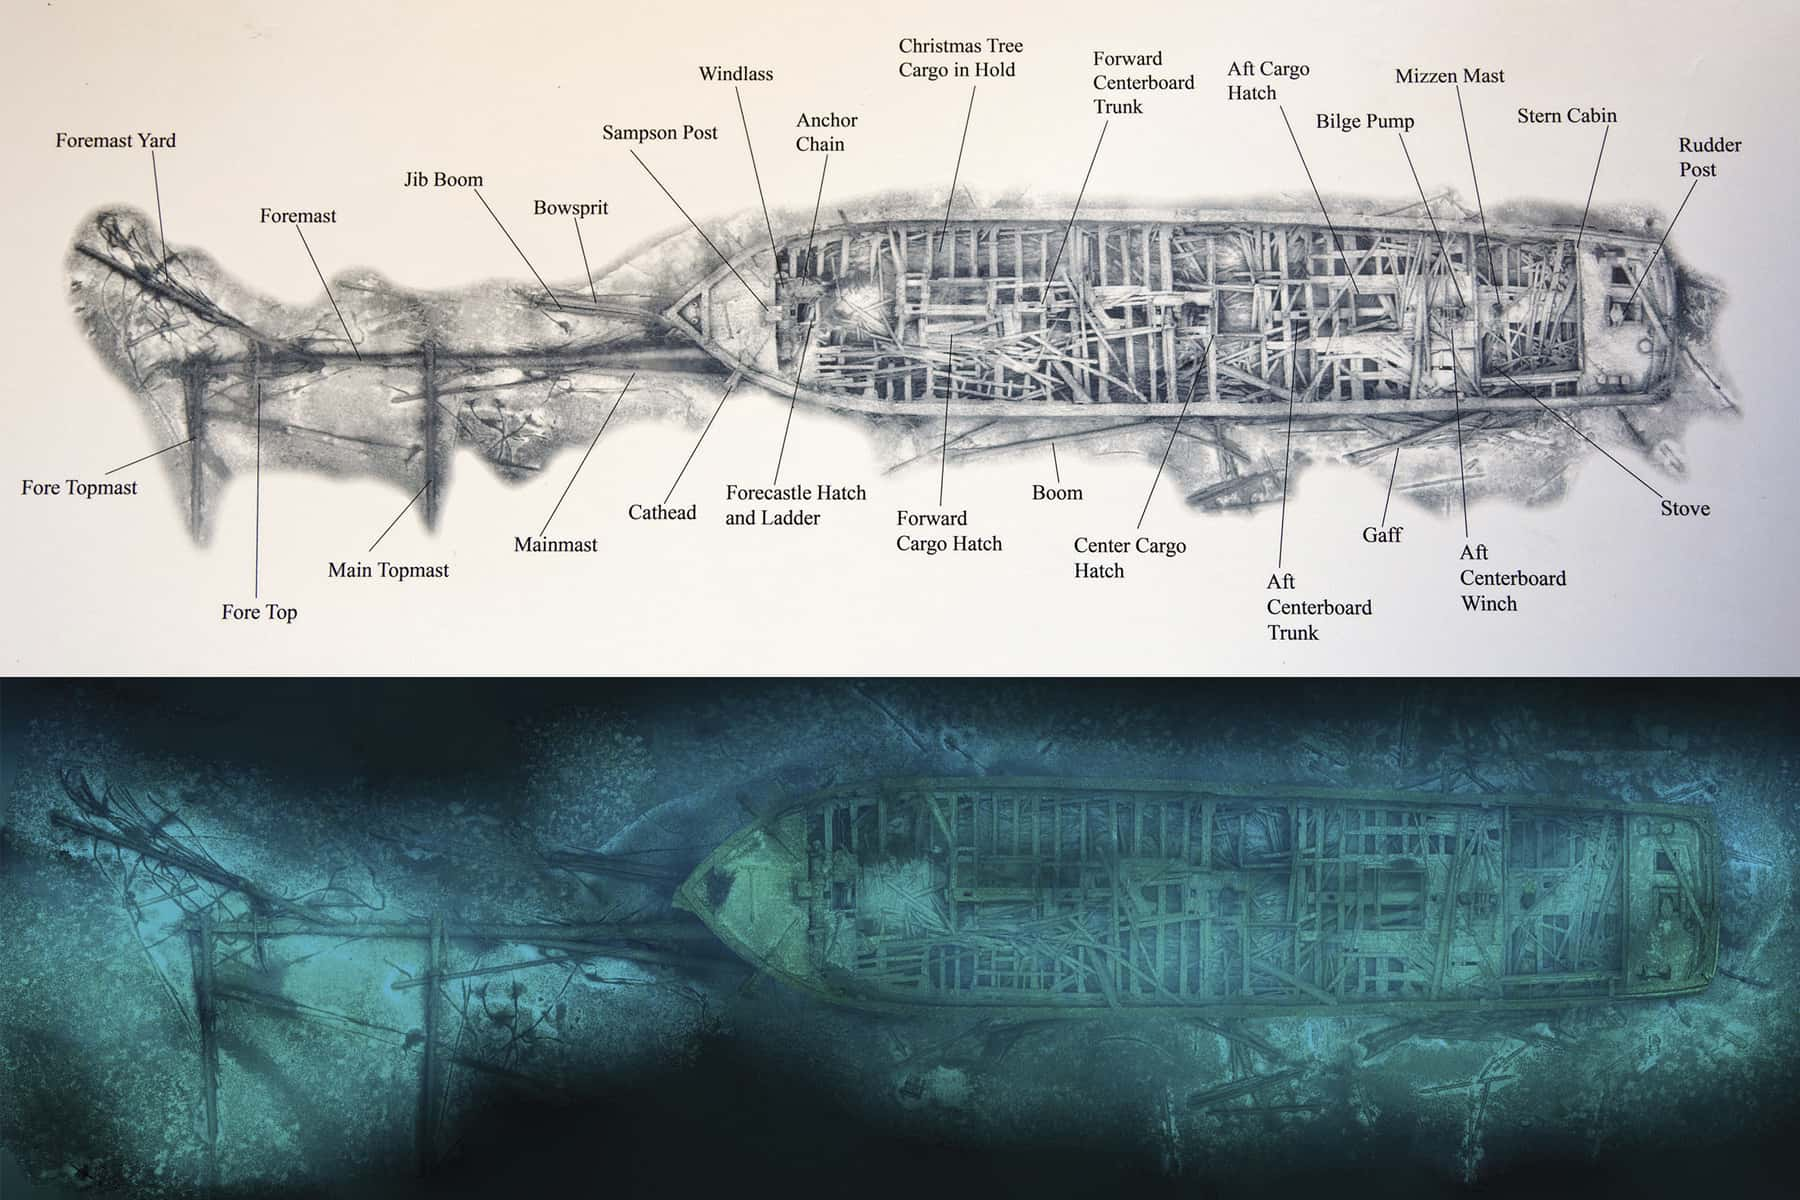 shipwreckchristmastree_03